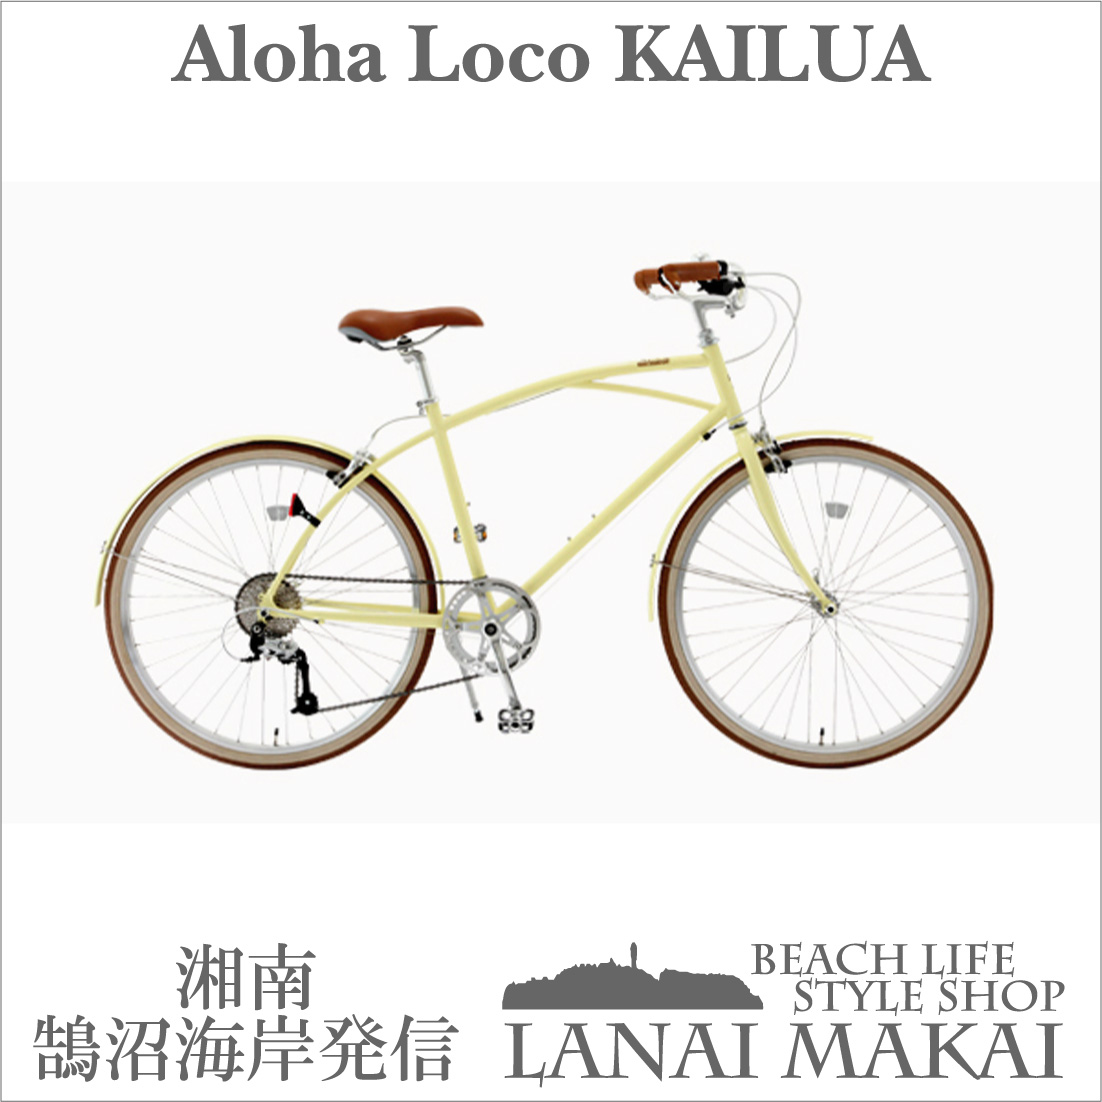 "【Aloha Loco Kailua】アロハロコ カイルア""26インチカジュアルバイク8段変速""COL:パステルイエロー湘南鵠沼海岸発信ビーチクルーザー クロスバイク"